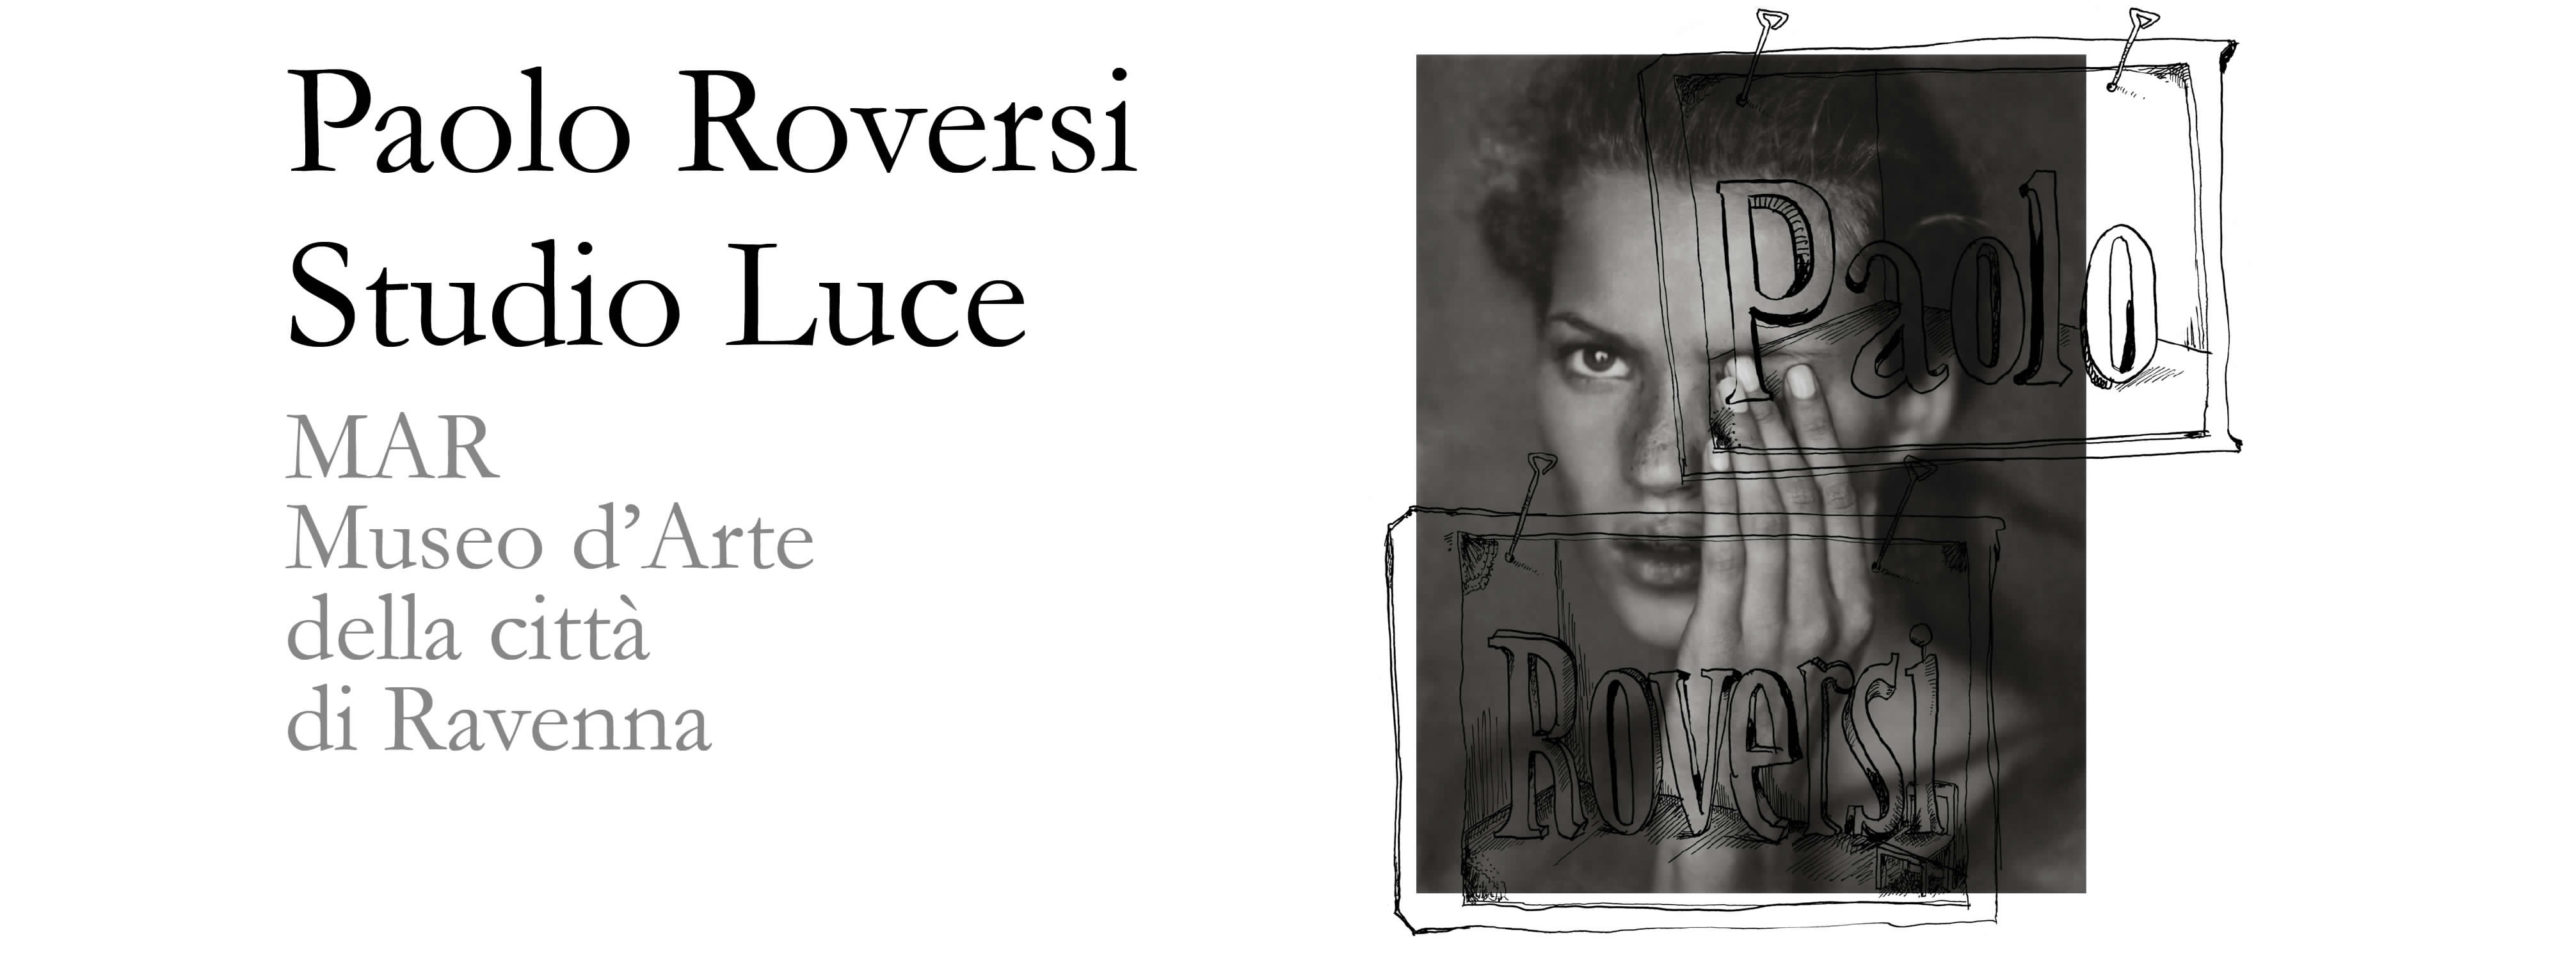 Paolo Roversi Studio Luce